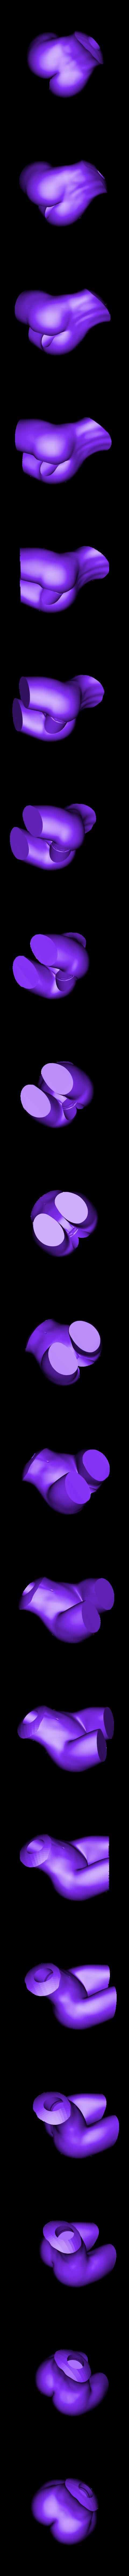 sdoll_02n_body.stl Download STL file Stroker Holder v1 (3D-Printable Sexercise Doll) • 3D printing design, SixLifeSeven